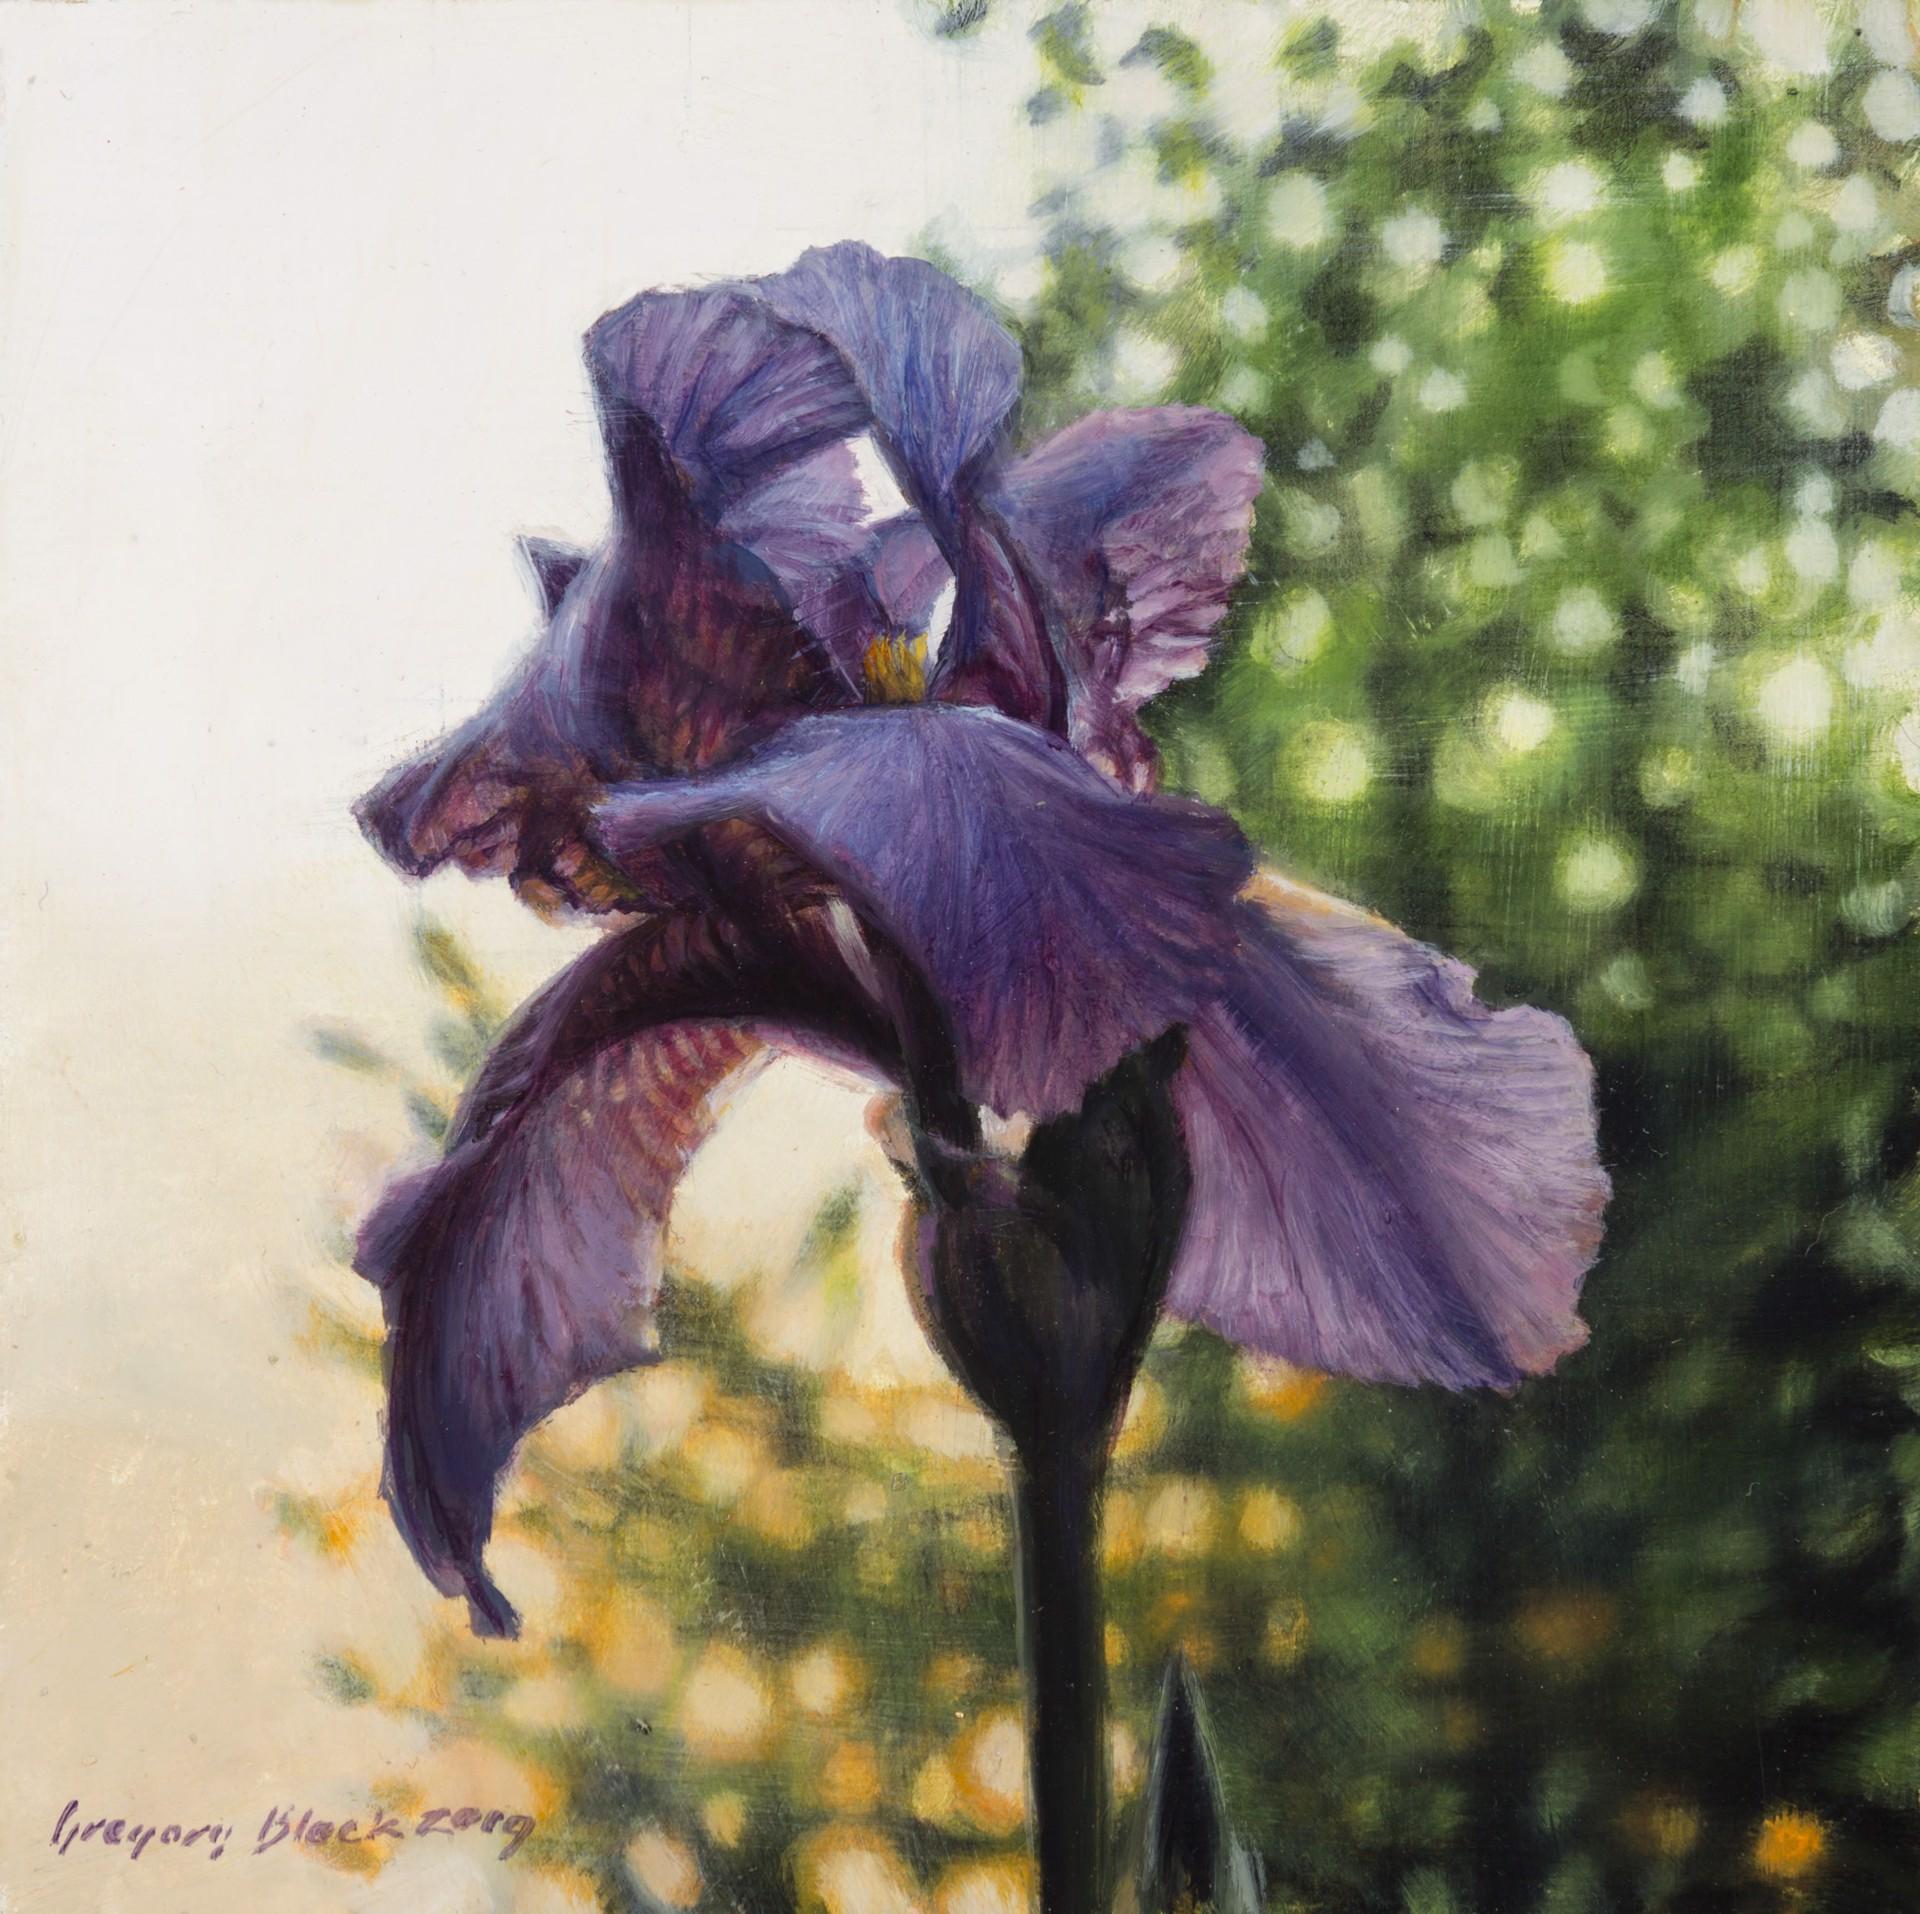 Iris 4 by Gregory Block